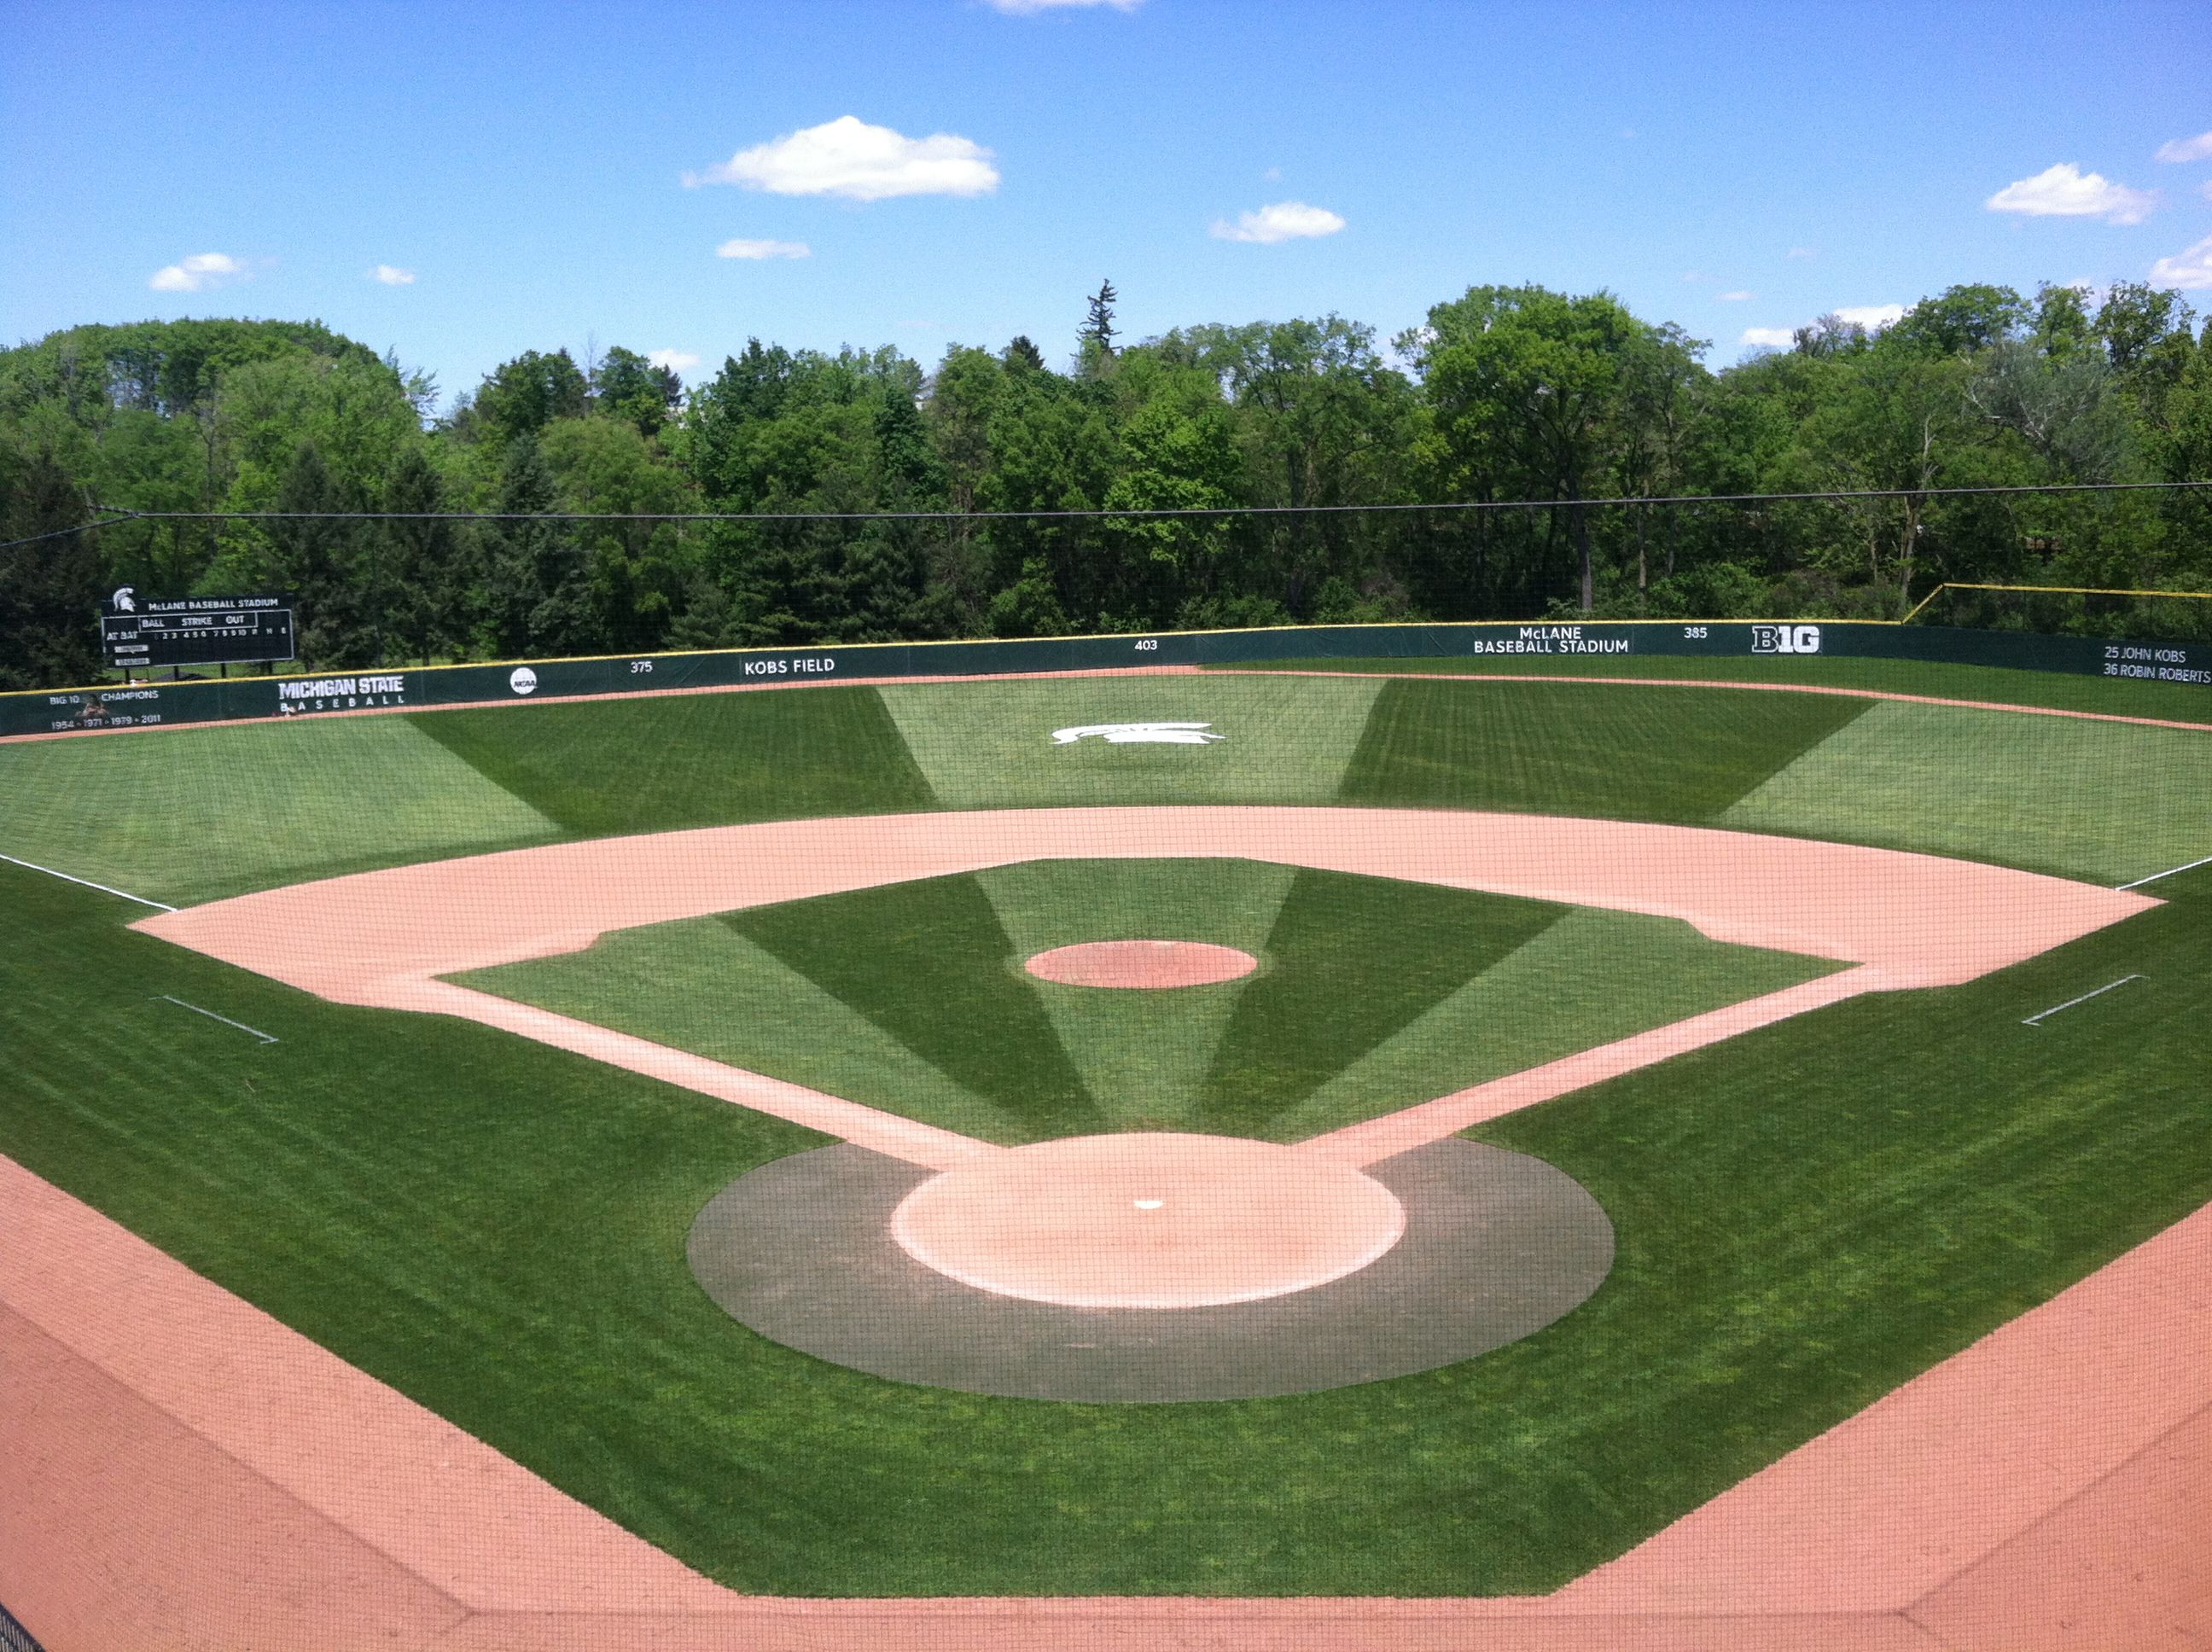 Michigan State Univesity Mclane Baseball Stadium At Kobs Field